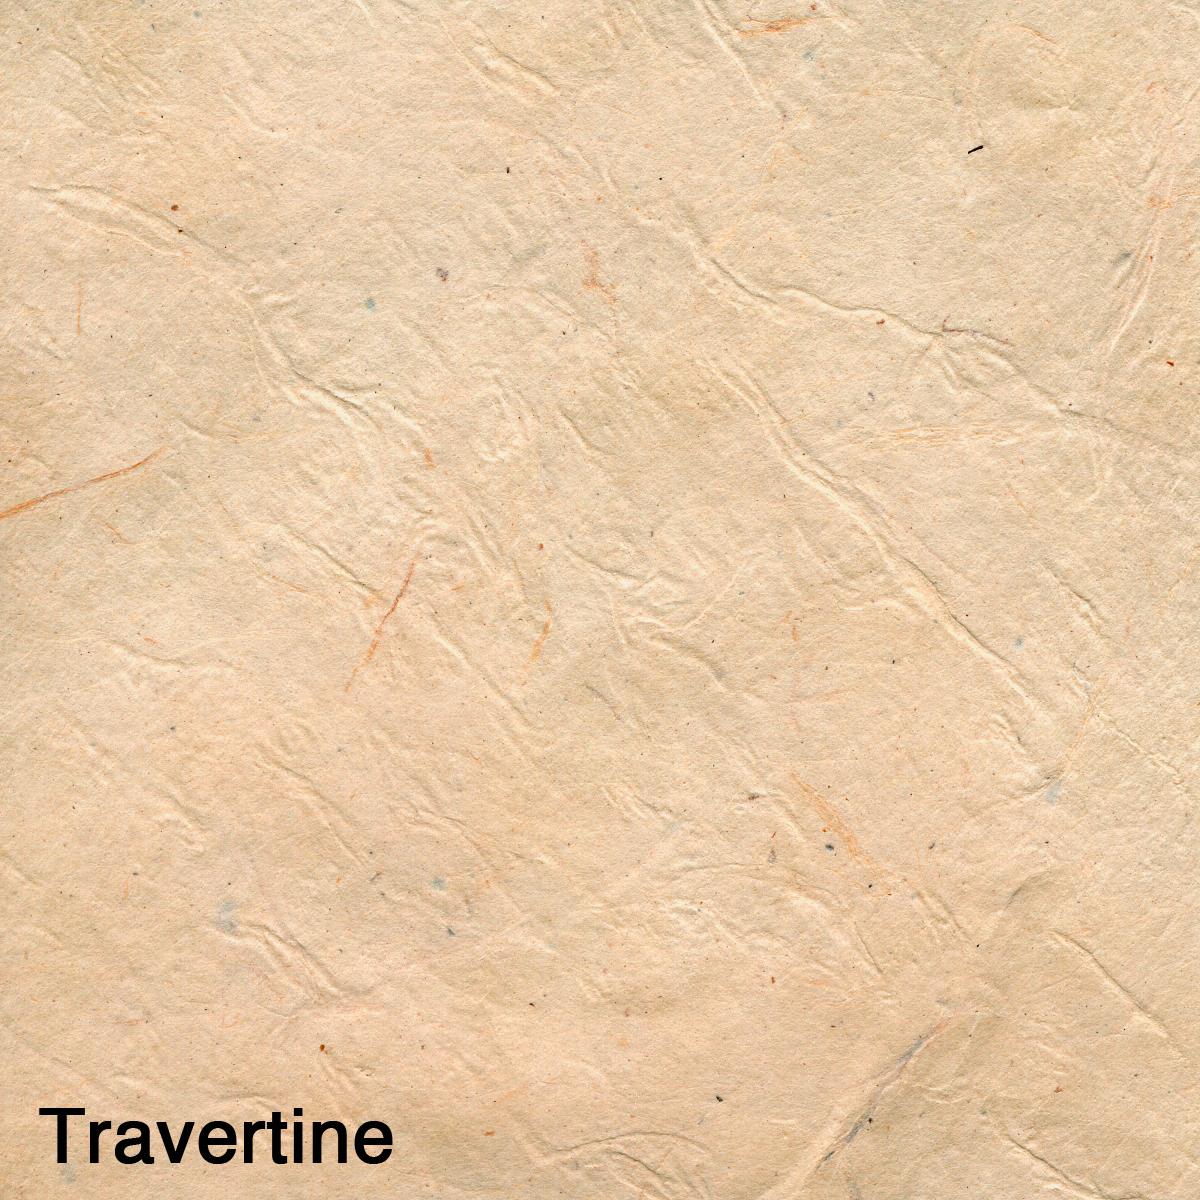 Travertine002.jpg